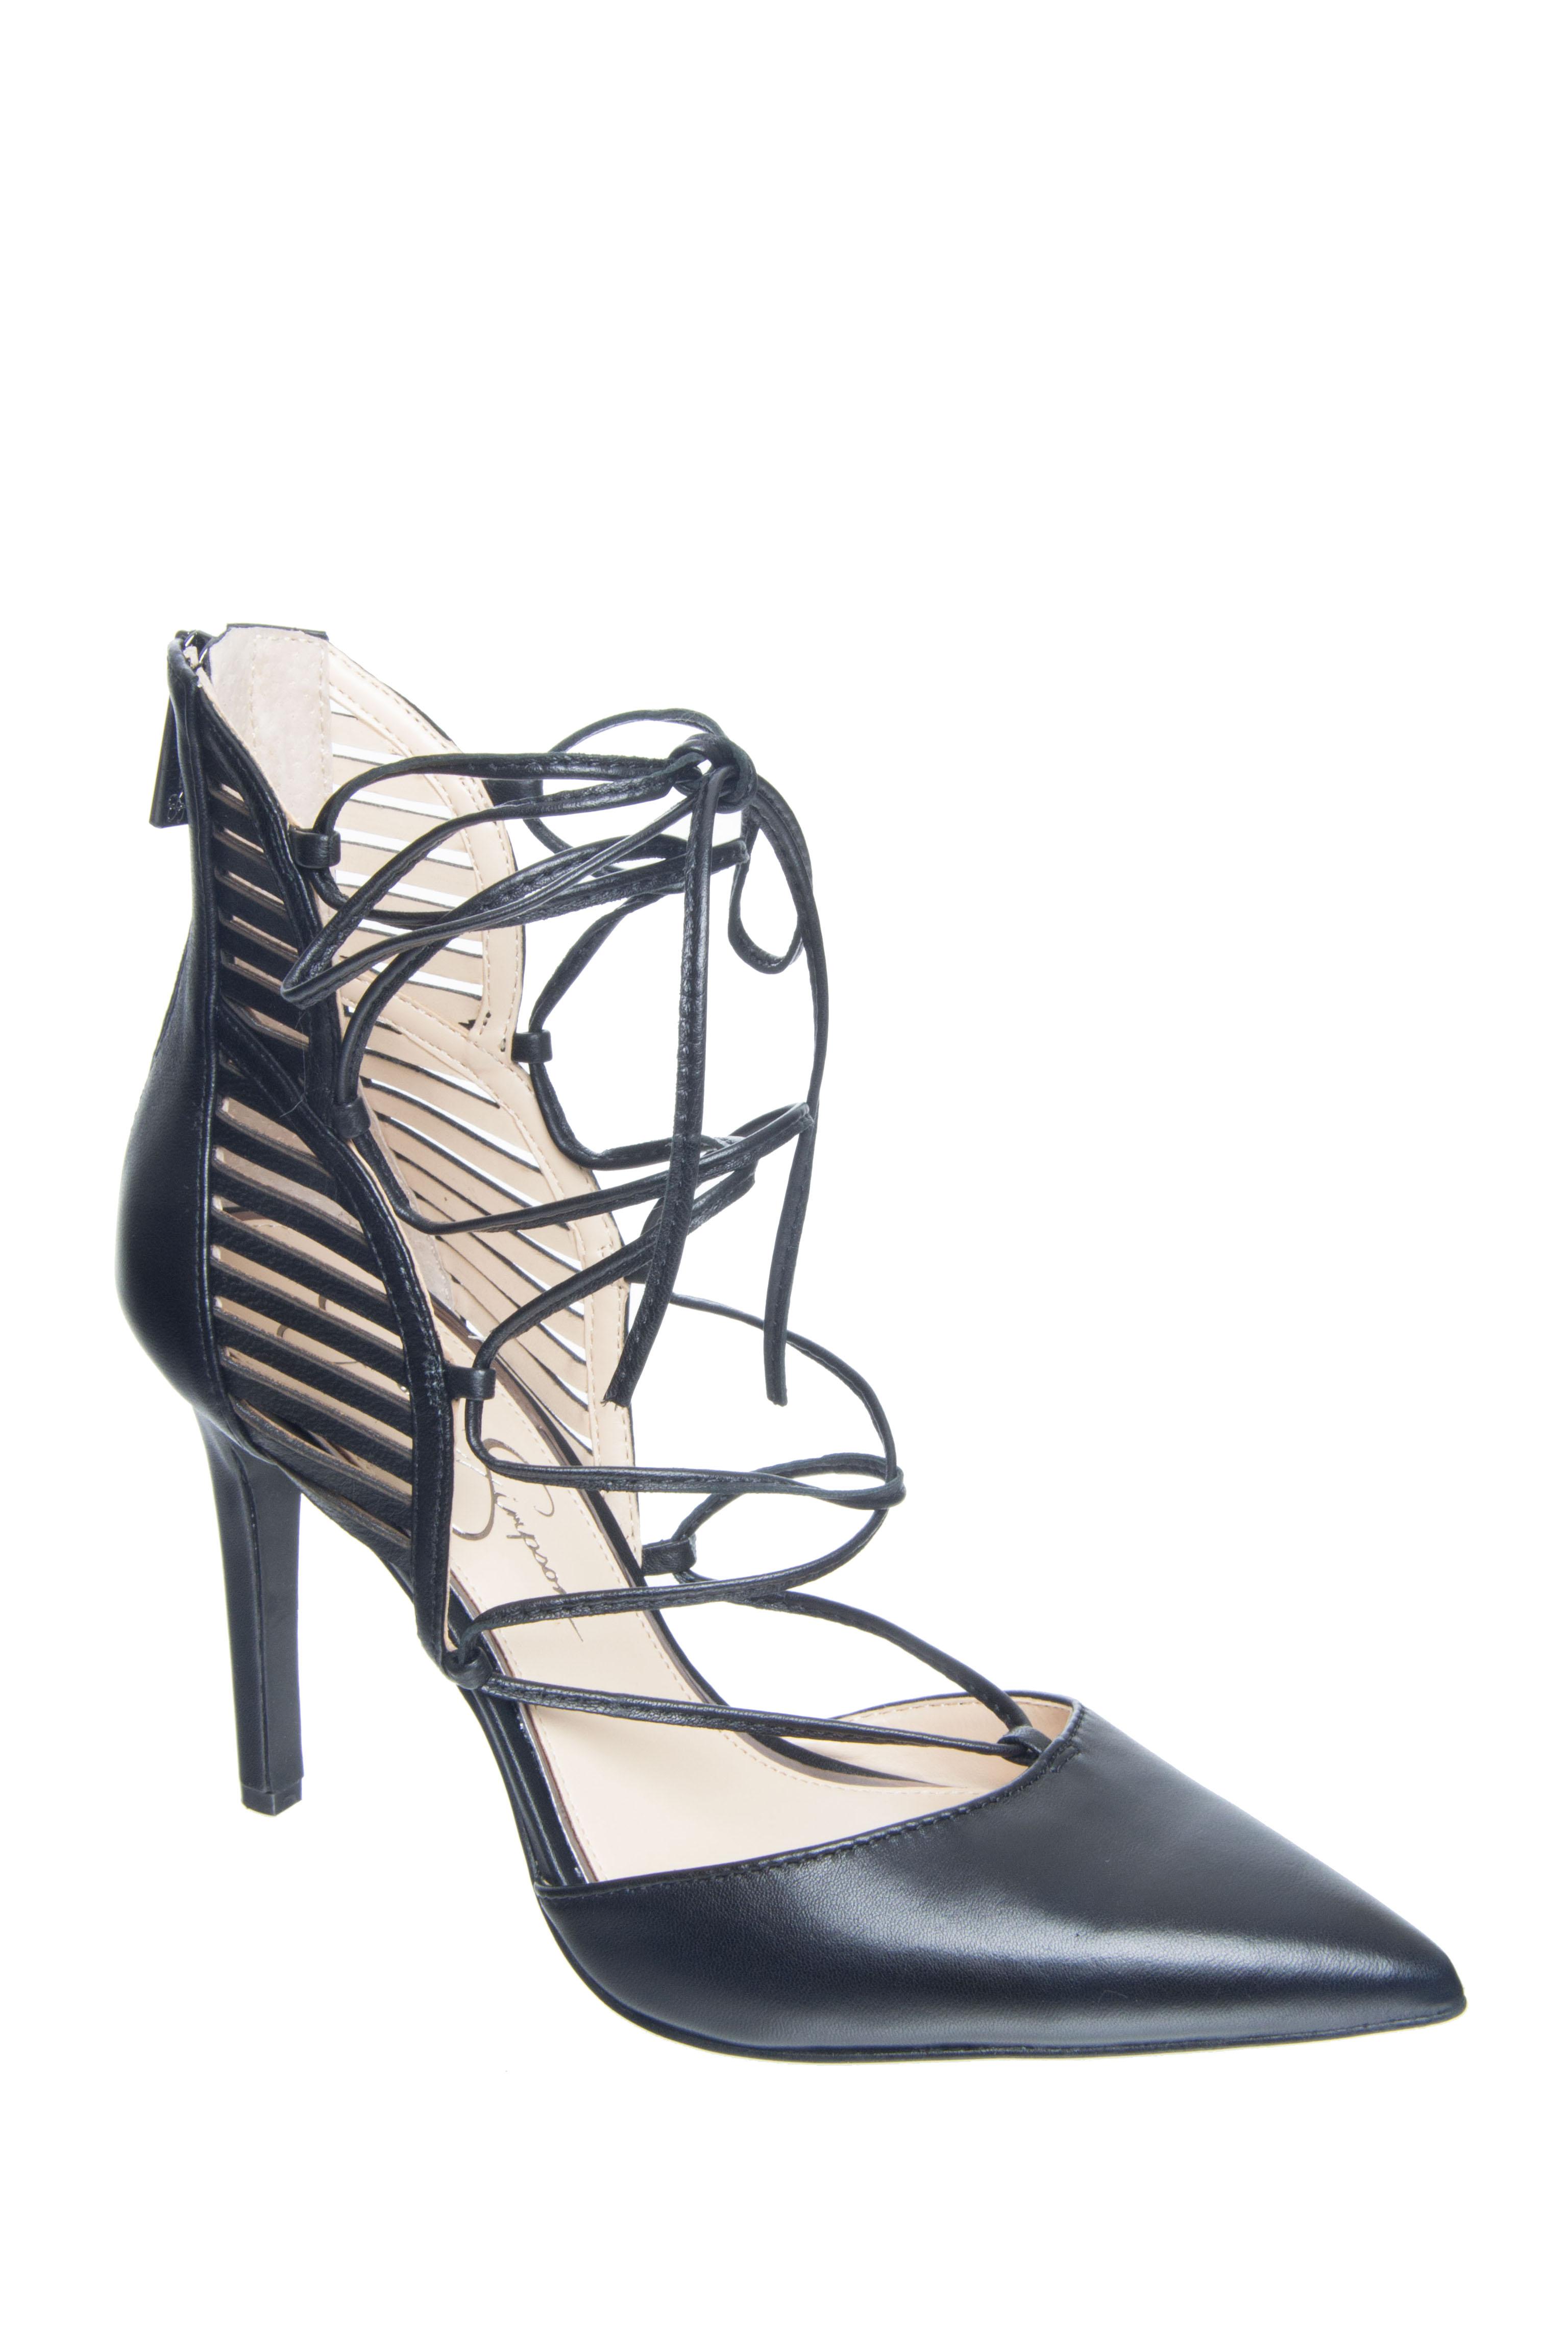 Jessica Simpson Cynessa Lace Up Heels - Black